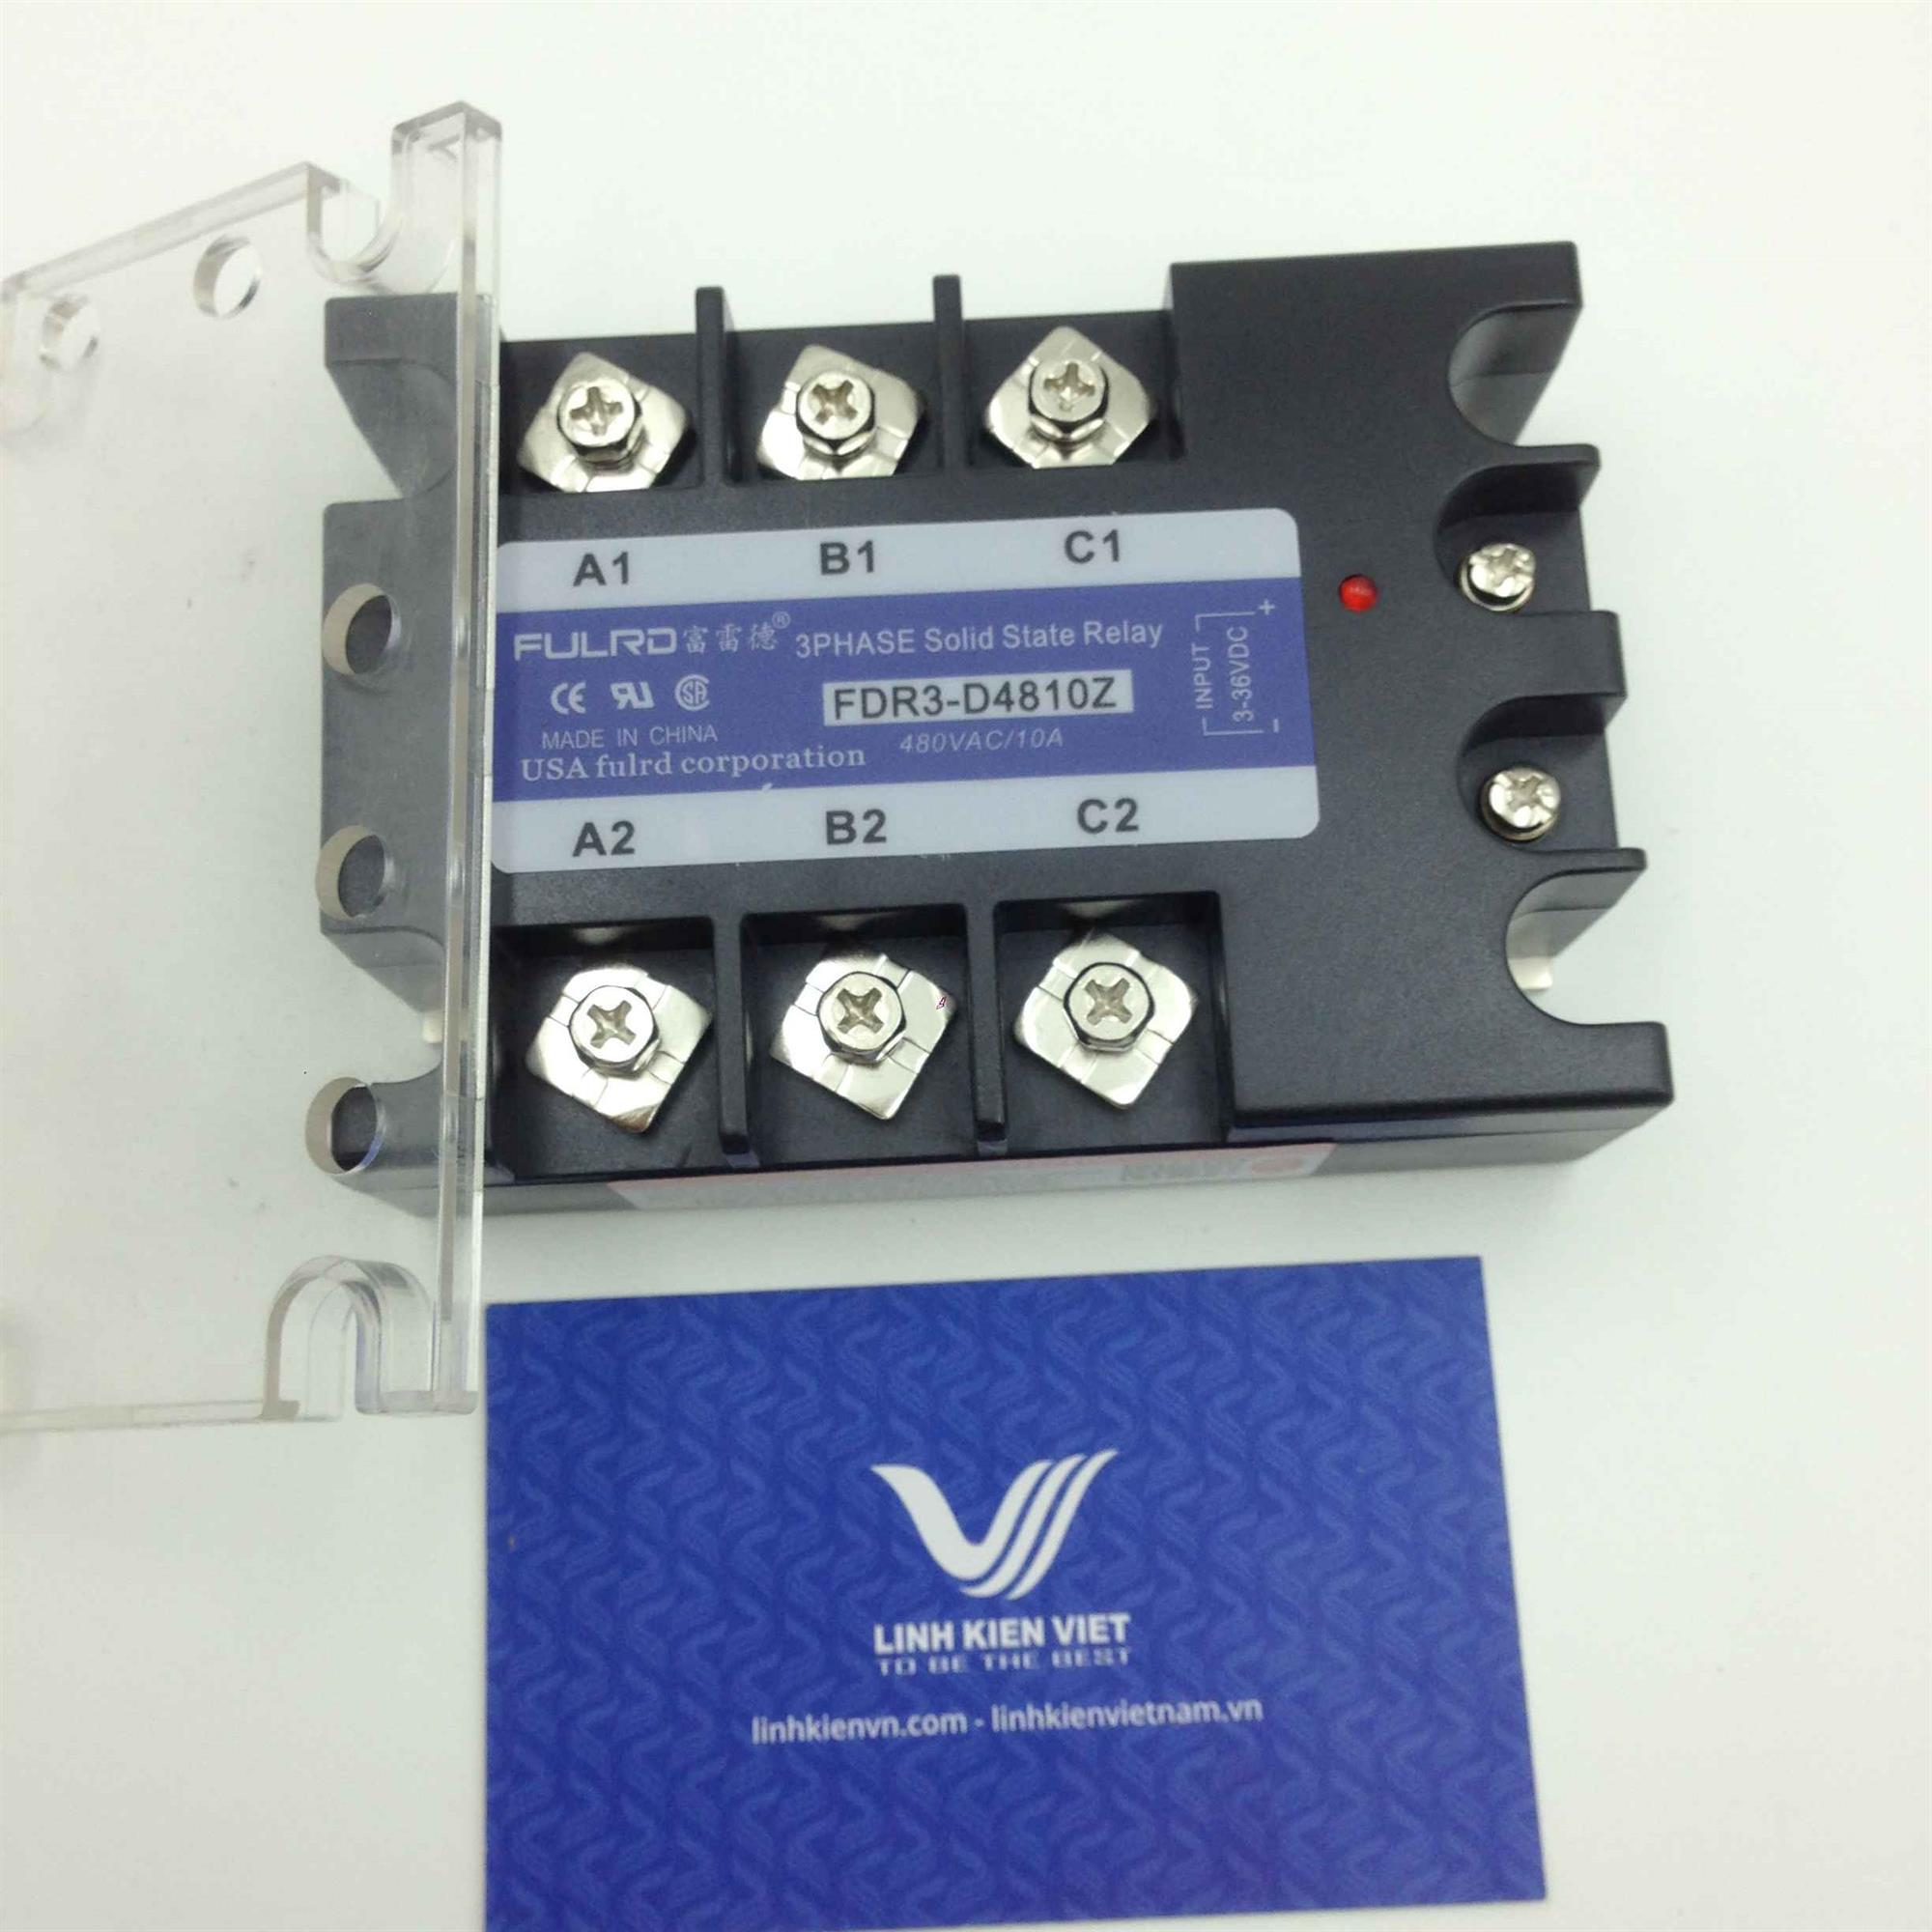 Relay bán dẫn 3 pha SSR 60A FDR3-D4860Z - (KB4H3)